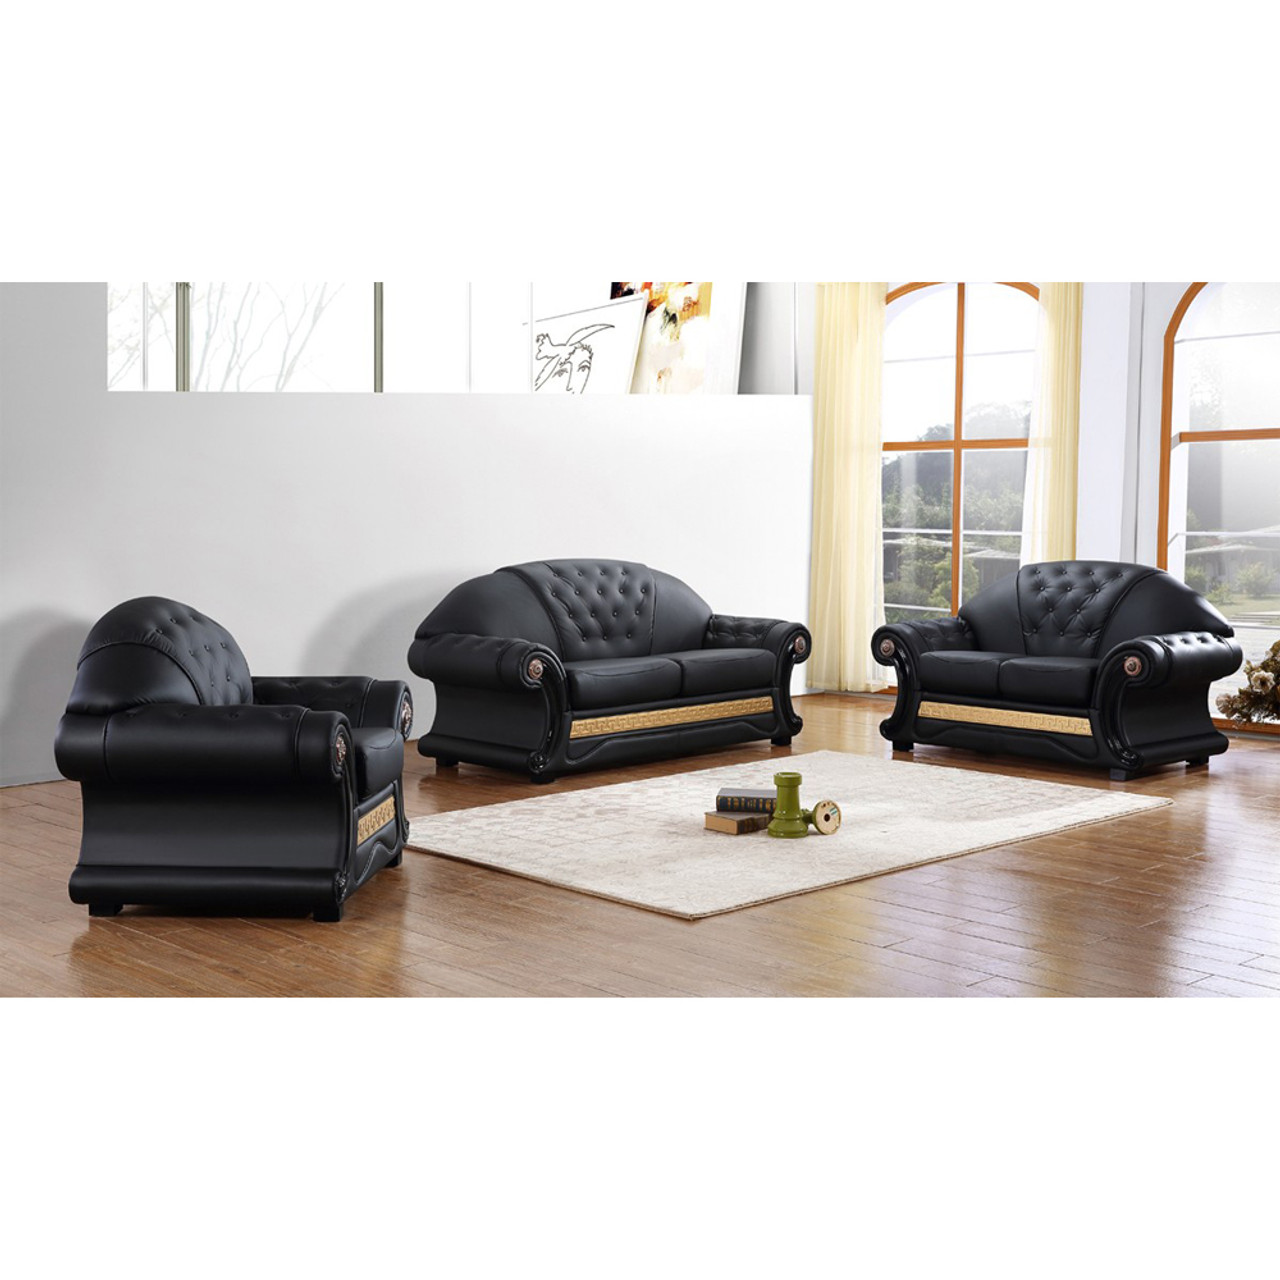 ... Divani Casa Cleopatra Traditional Black Leather Sofa Set ...